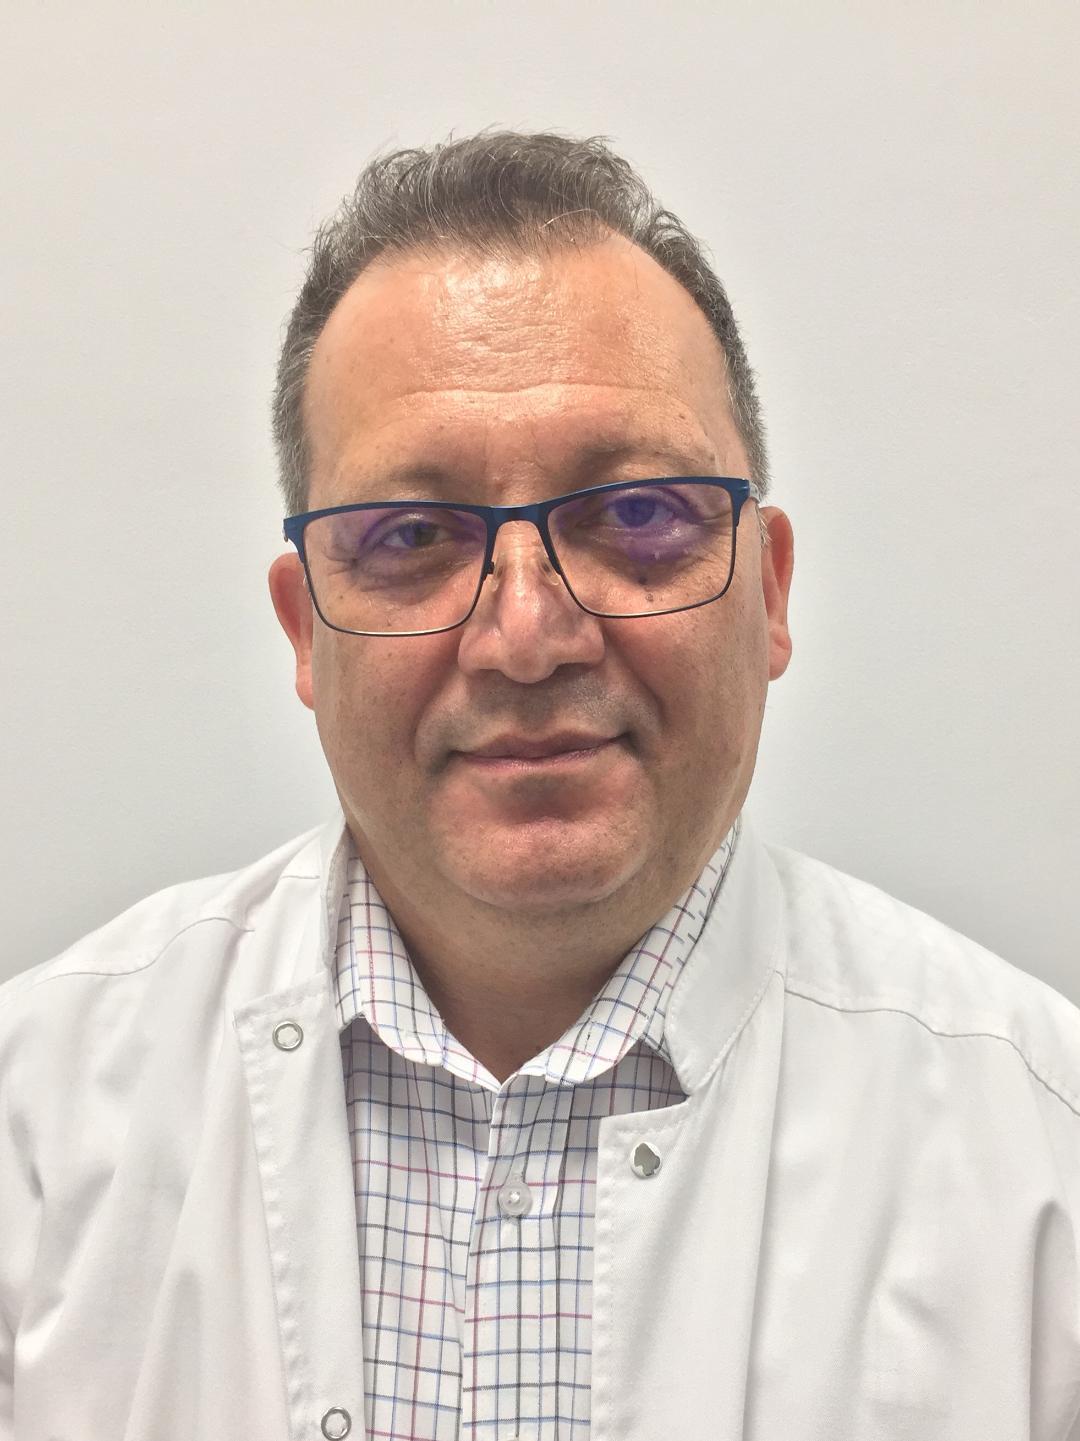 Dr. Catalin Buzulescu